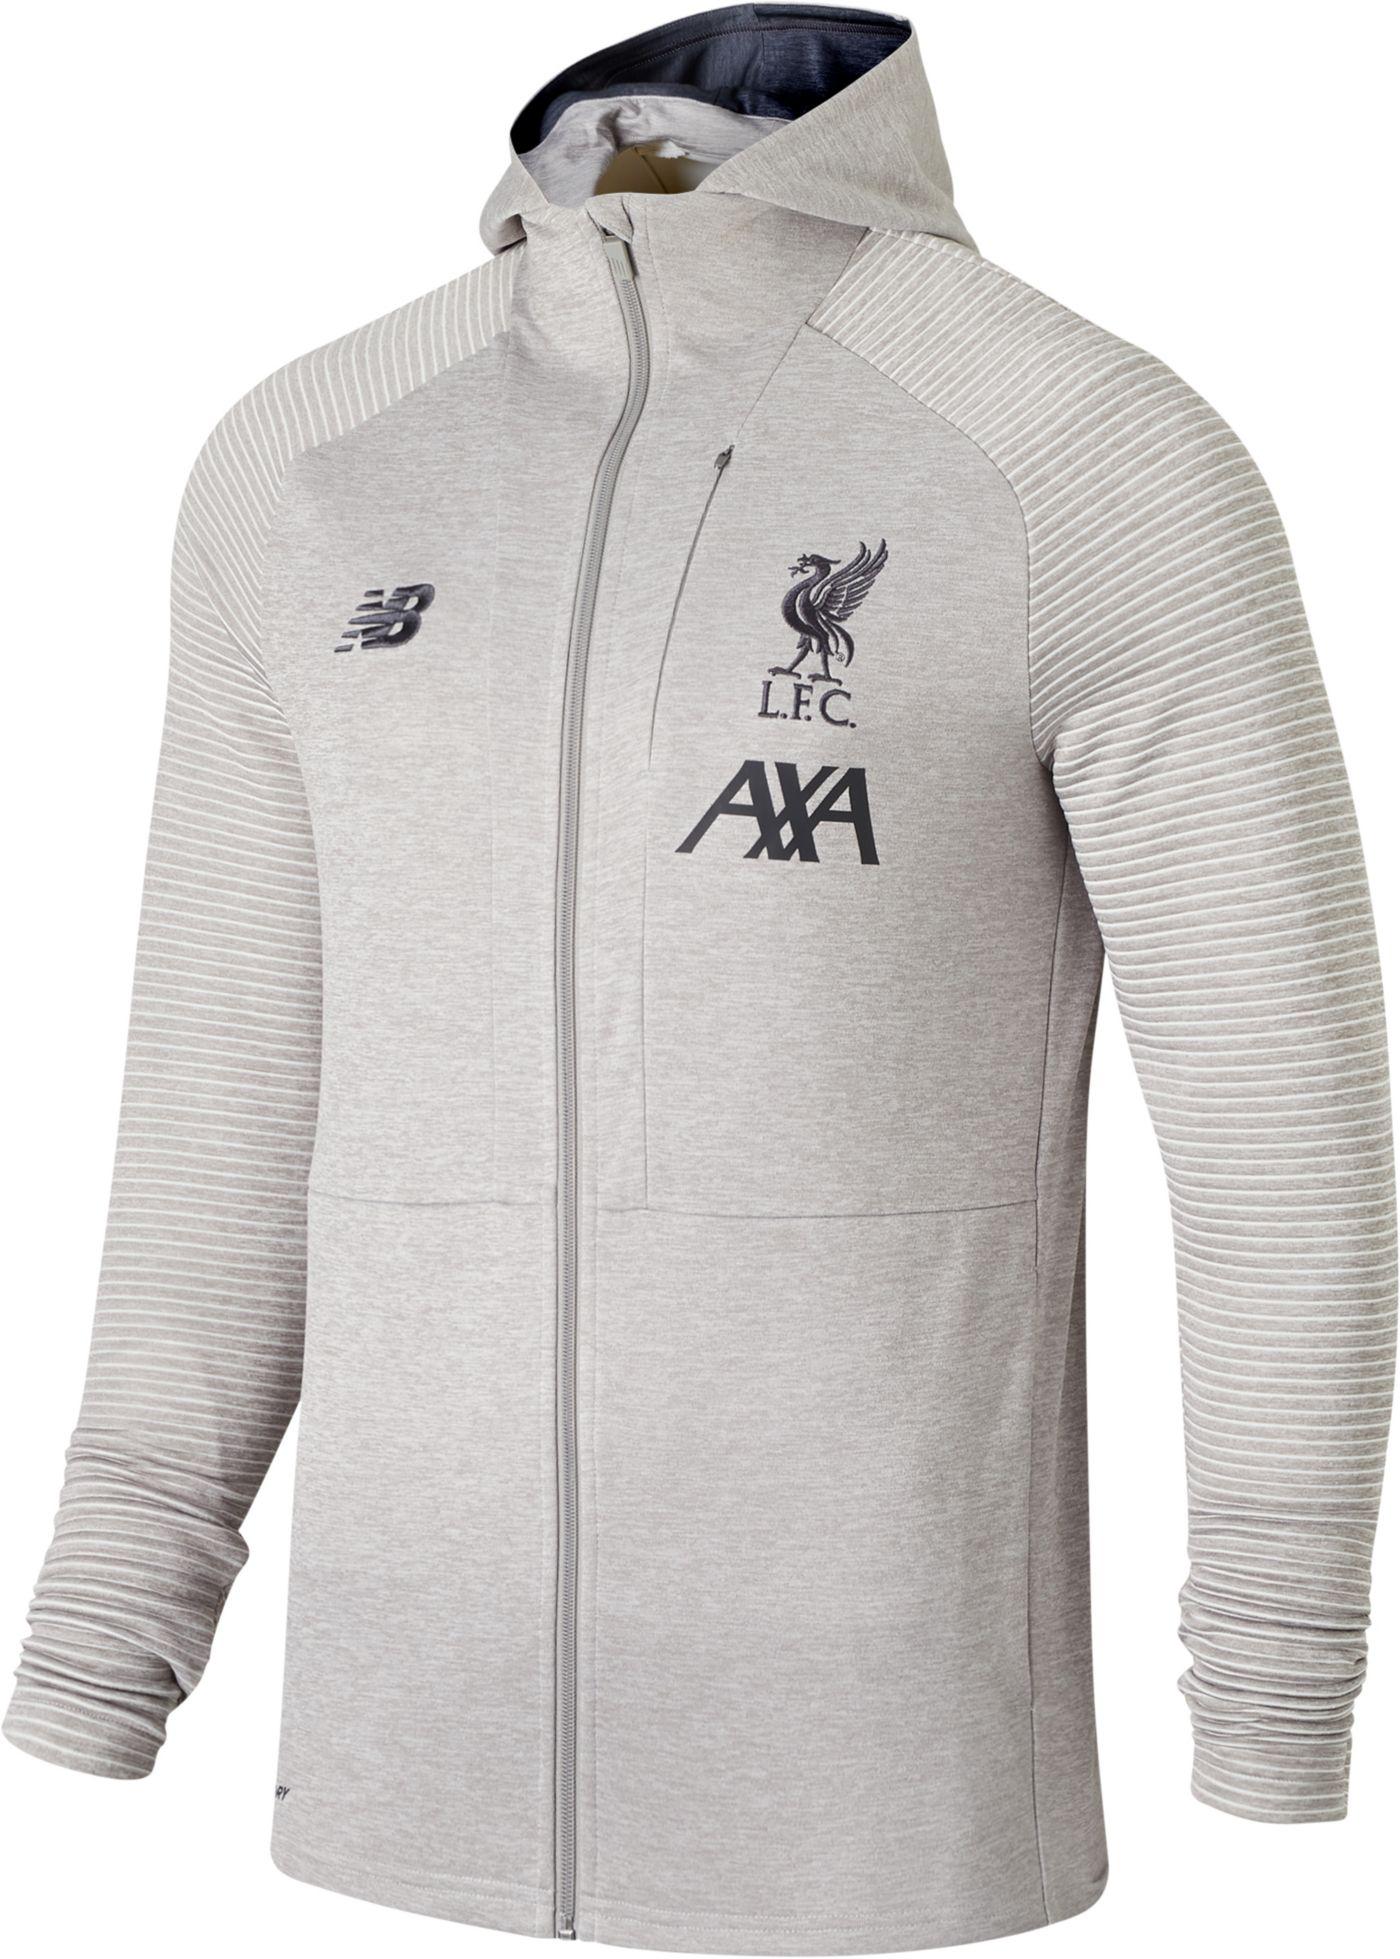 New Balance Youth Liverpool FC Travel Heather Grey Full-Zip Jacket